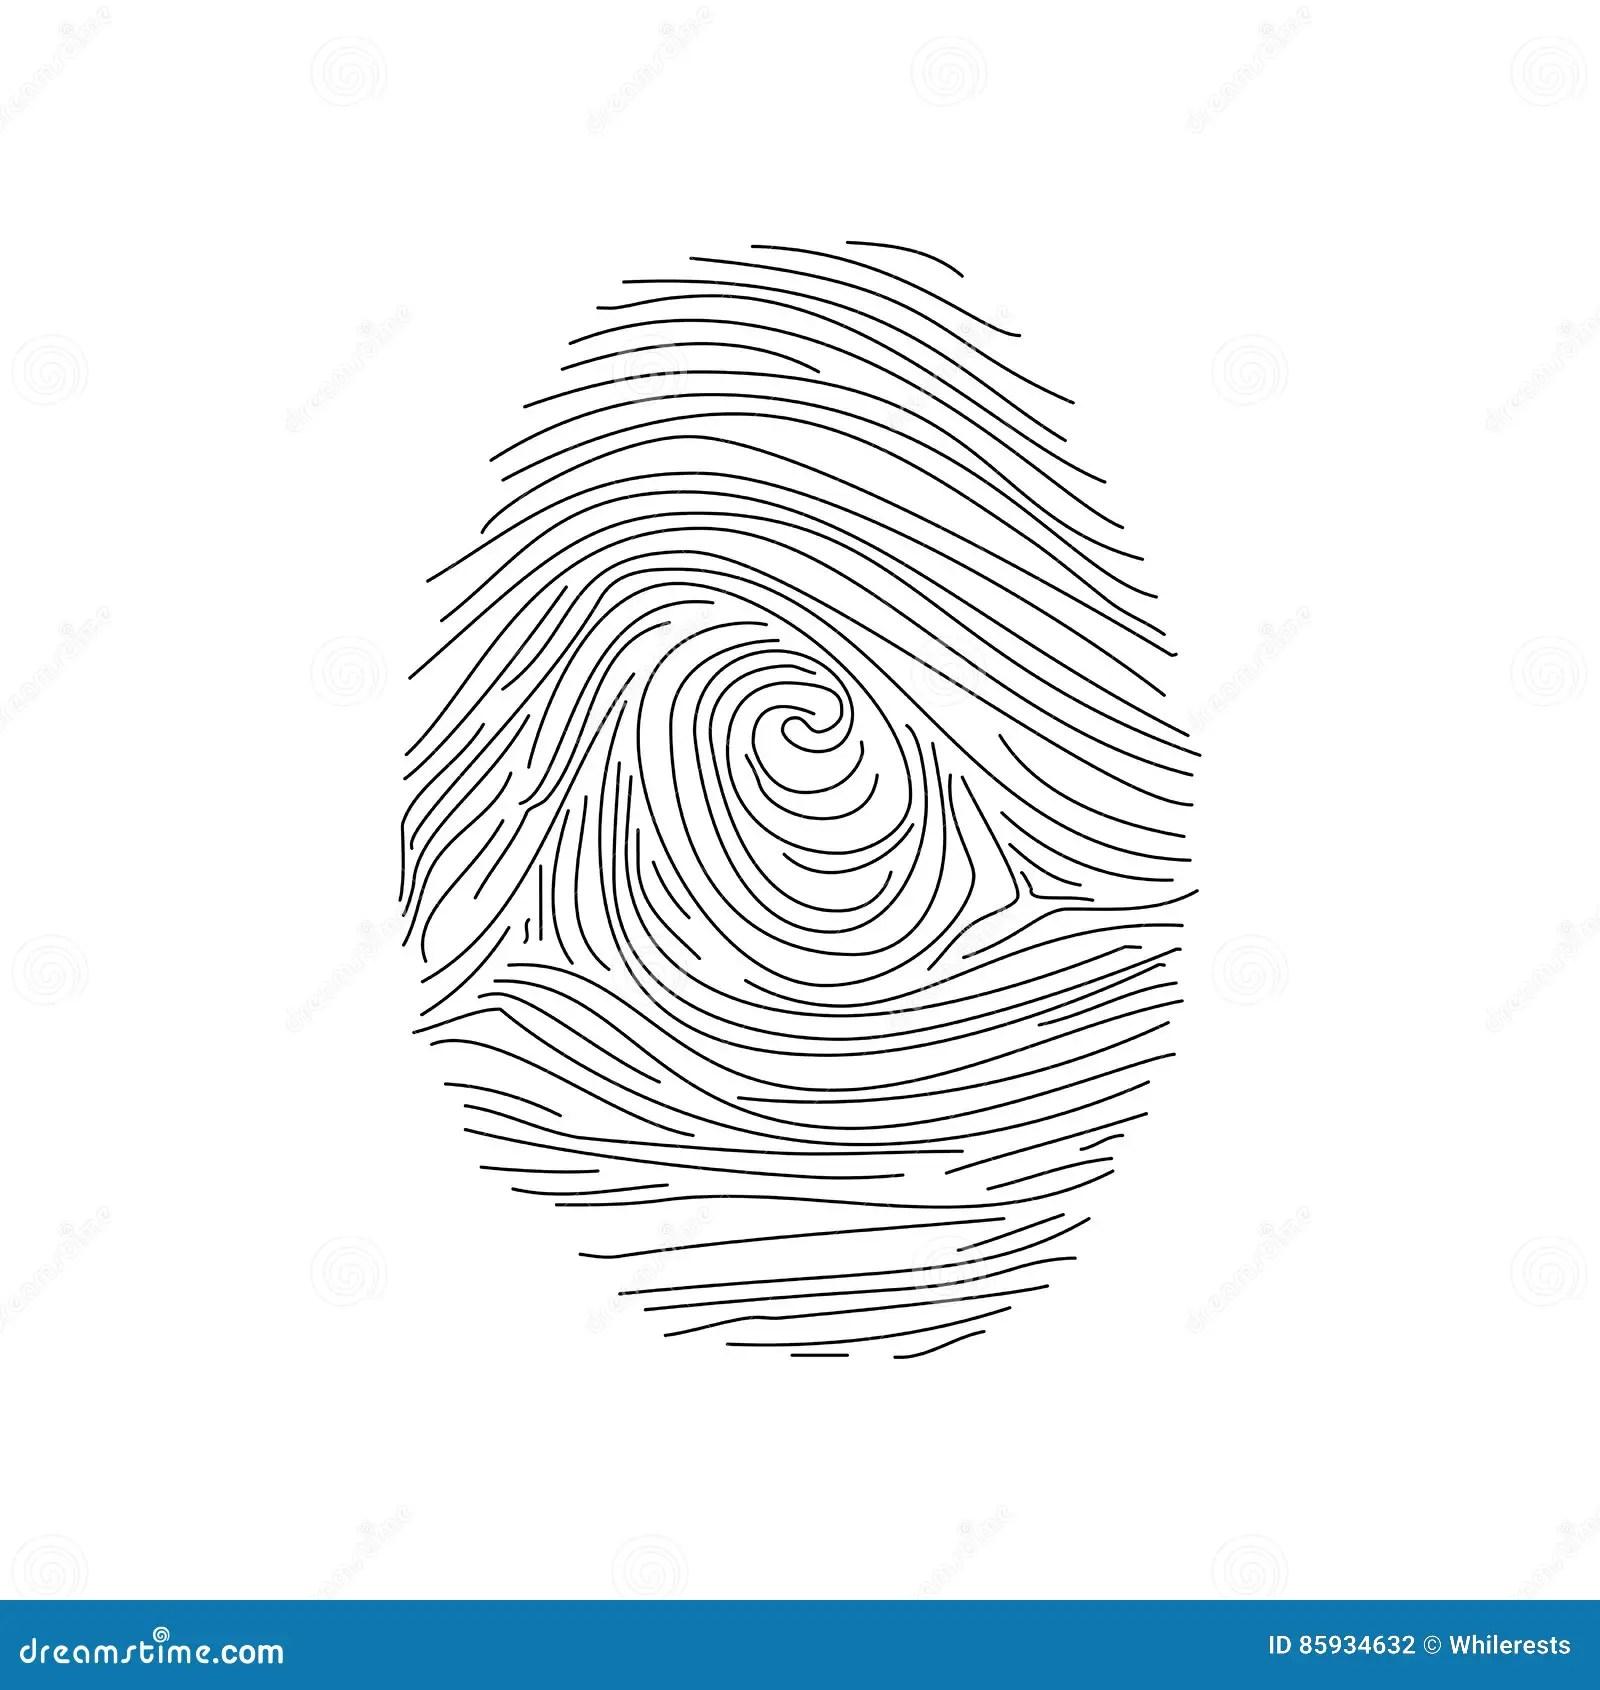 Set Of Fingerprints, Illustration Royalty-Free Cartoon